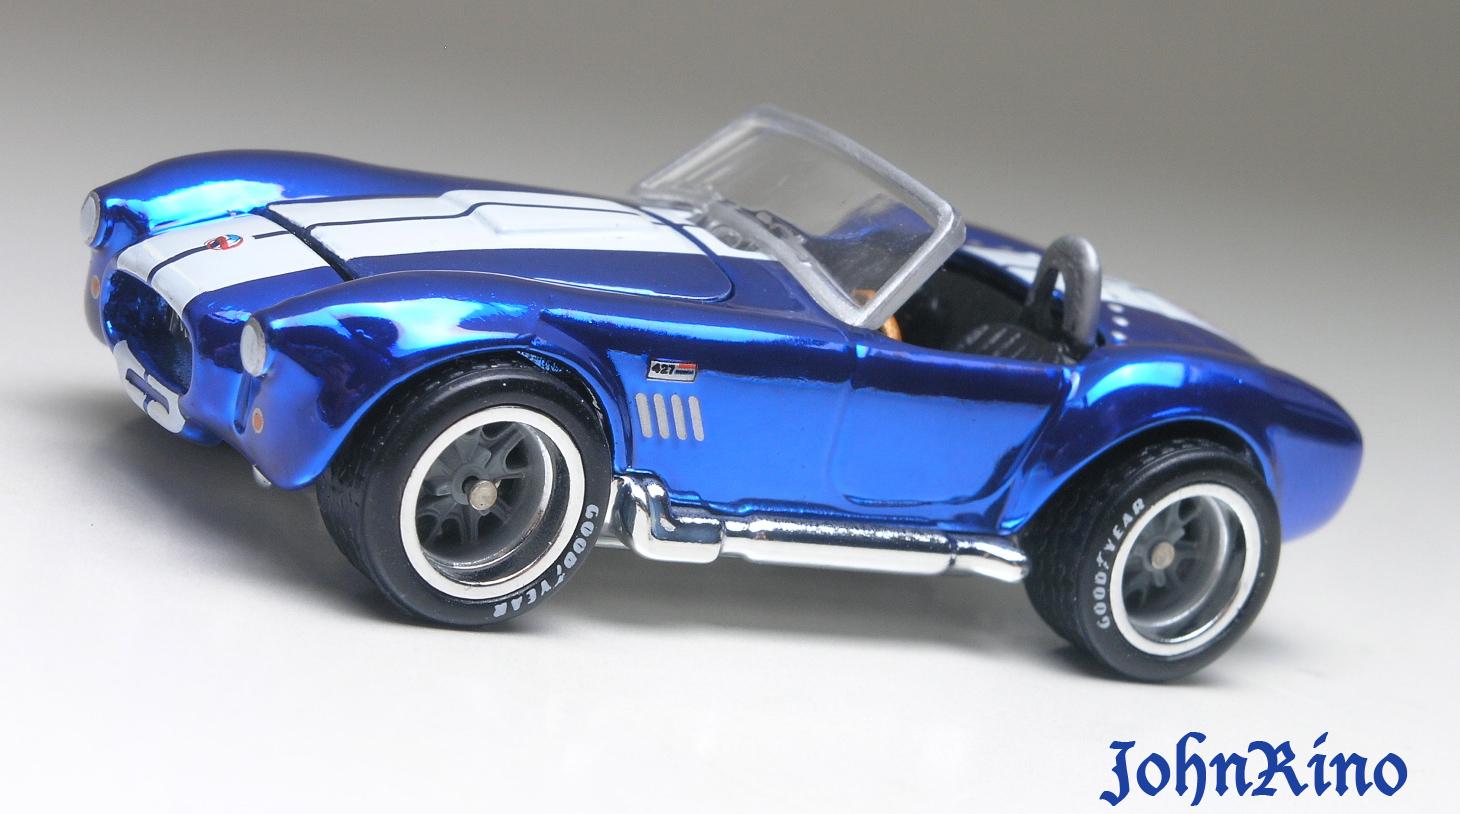 First look hot wheels rlc commemorative shelby cobra 427 s c by john rino